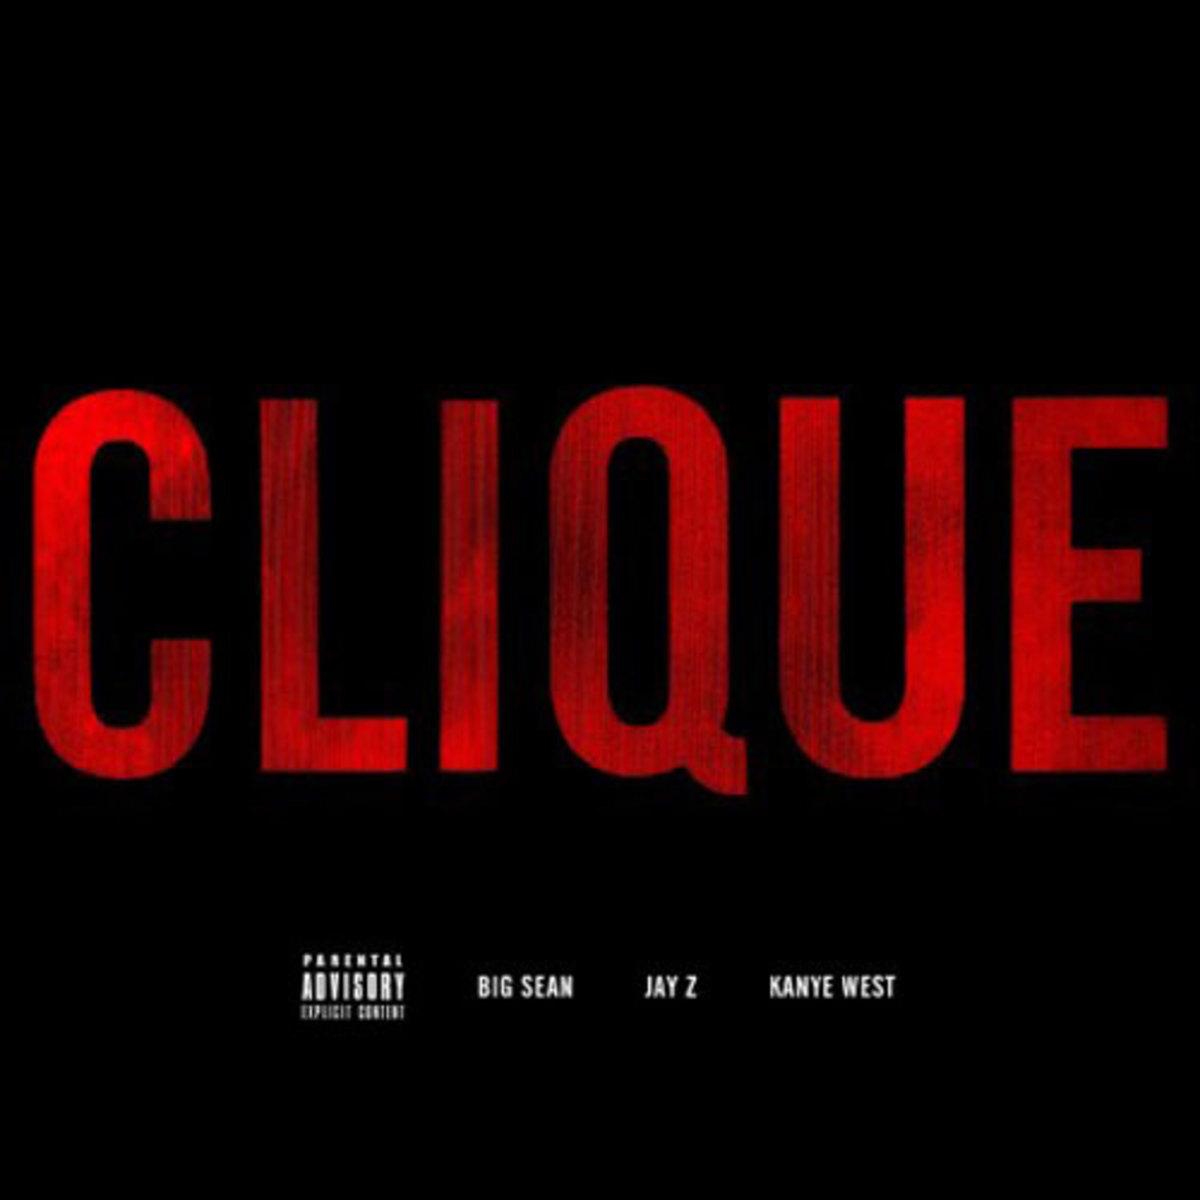 bigsean-clique.jpg